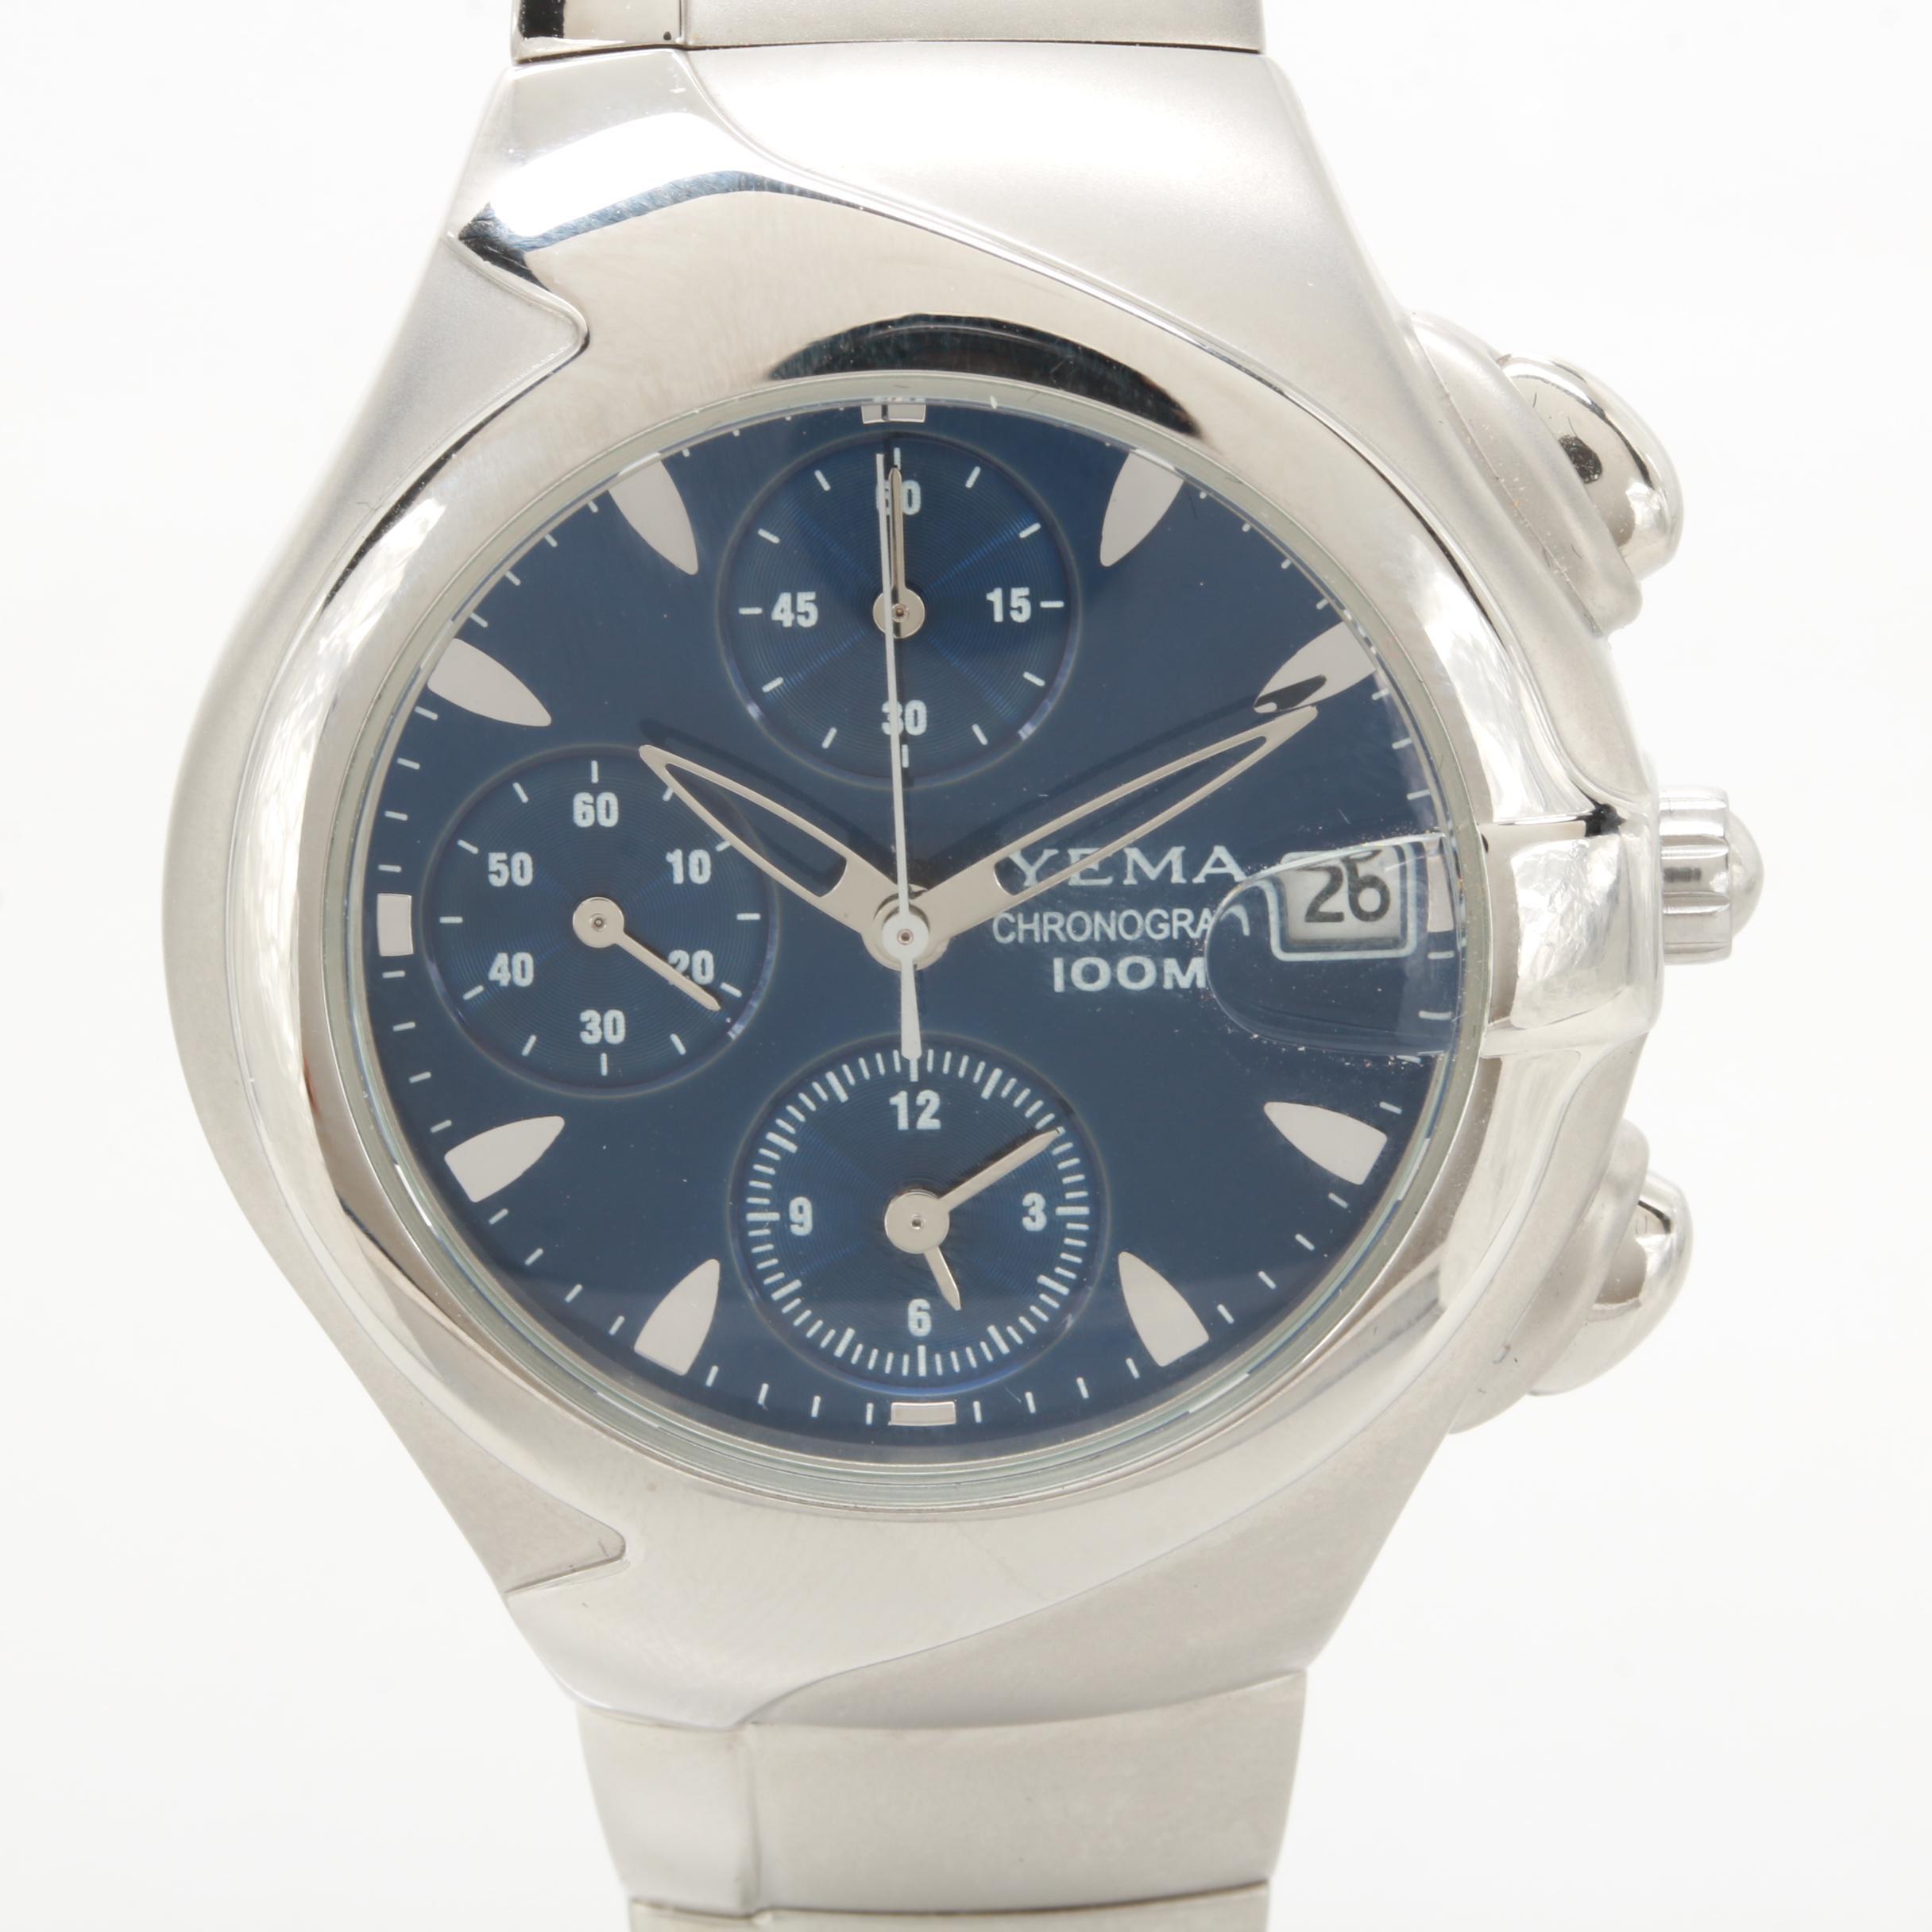 Yema Model YA256 Quartz Chronograph Watch